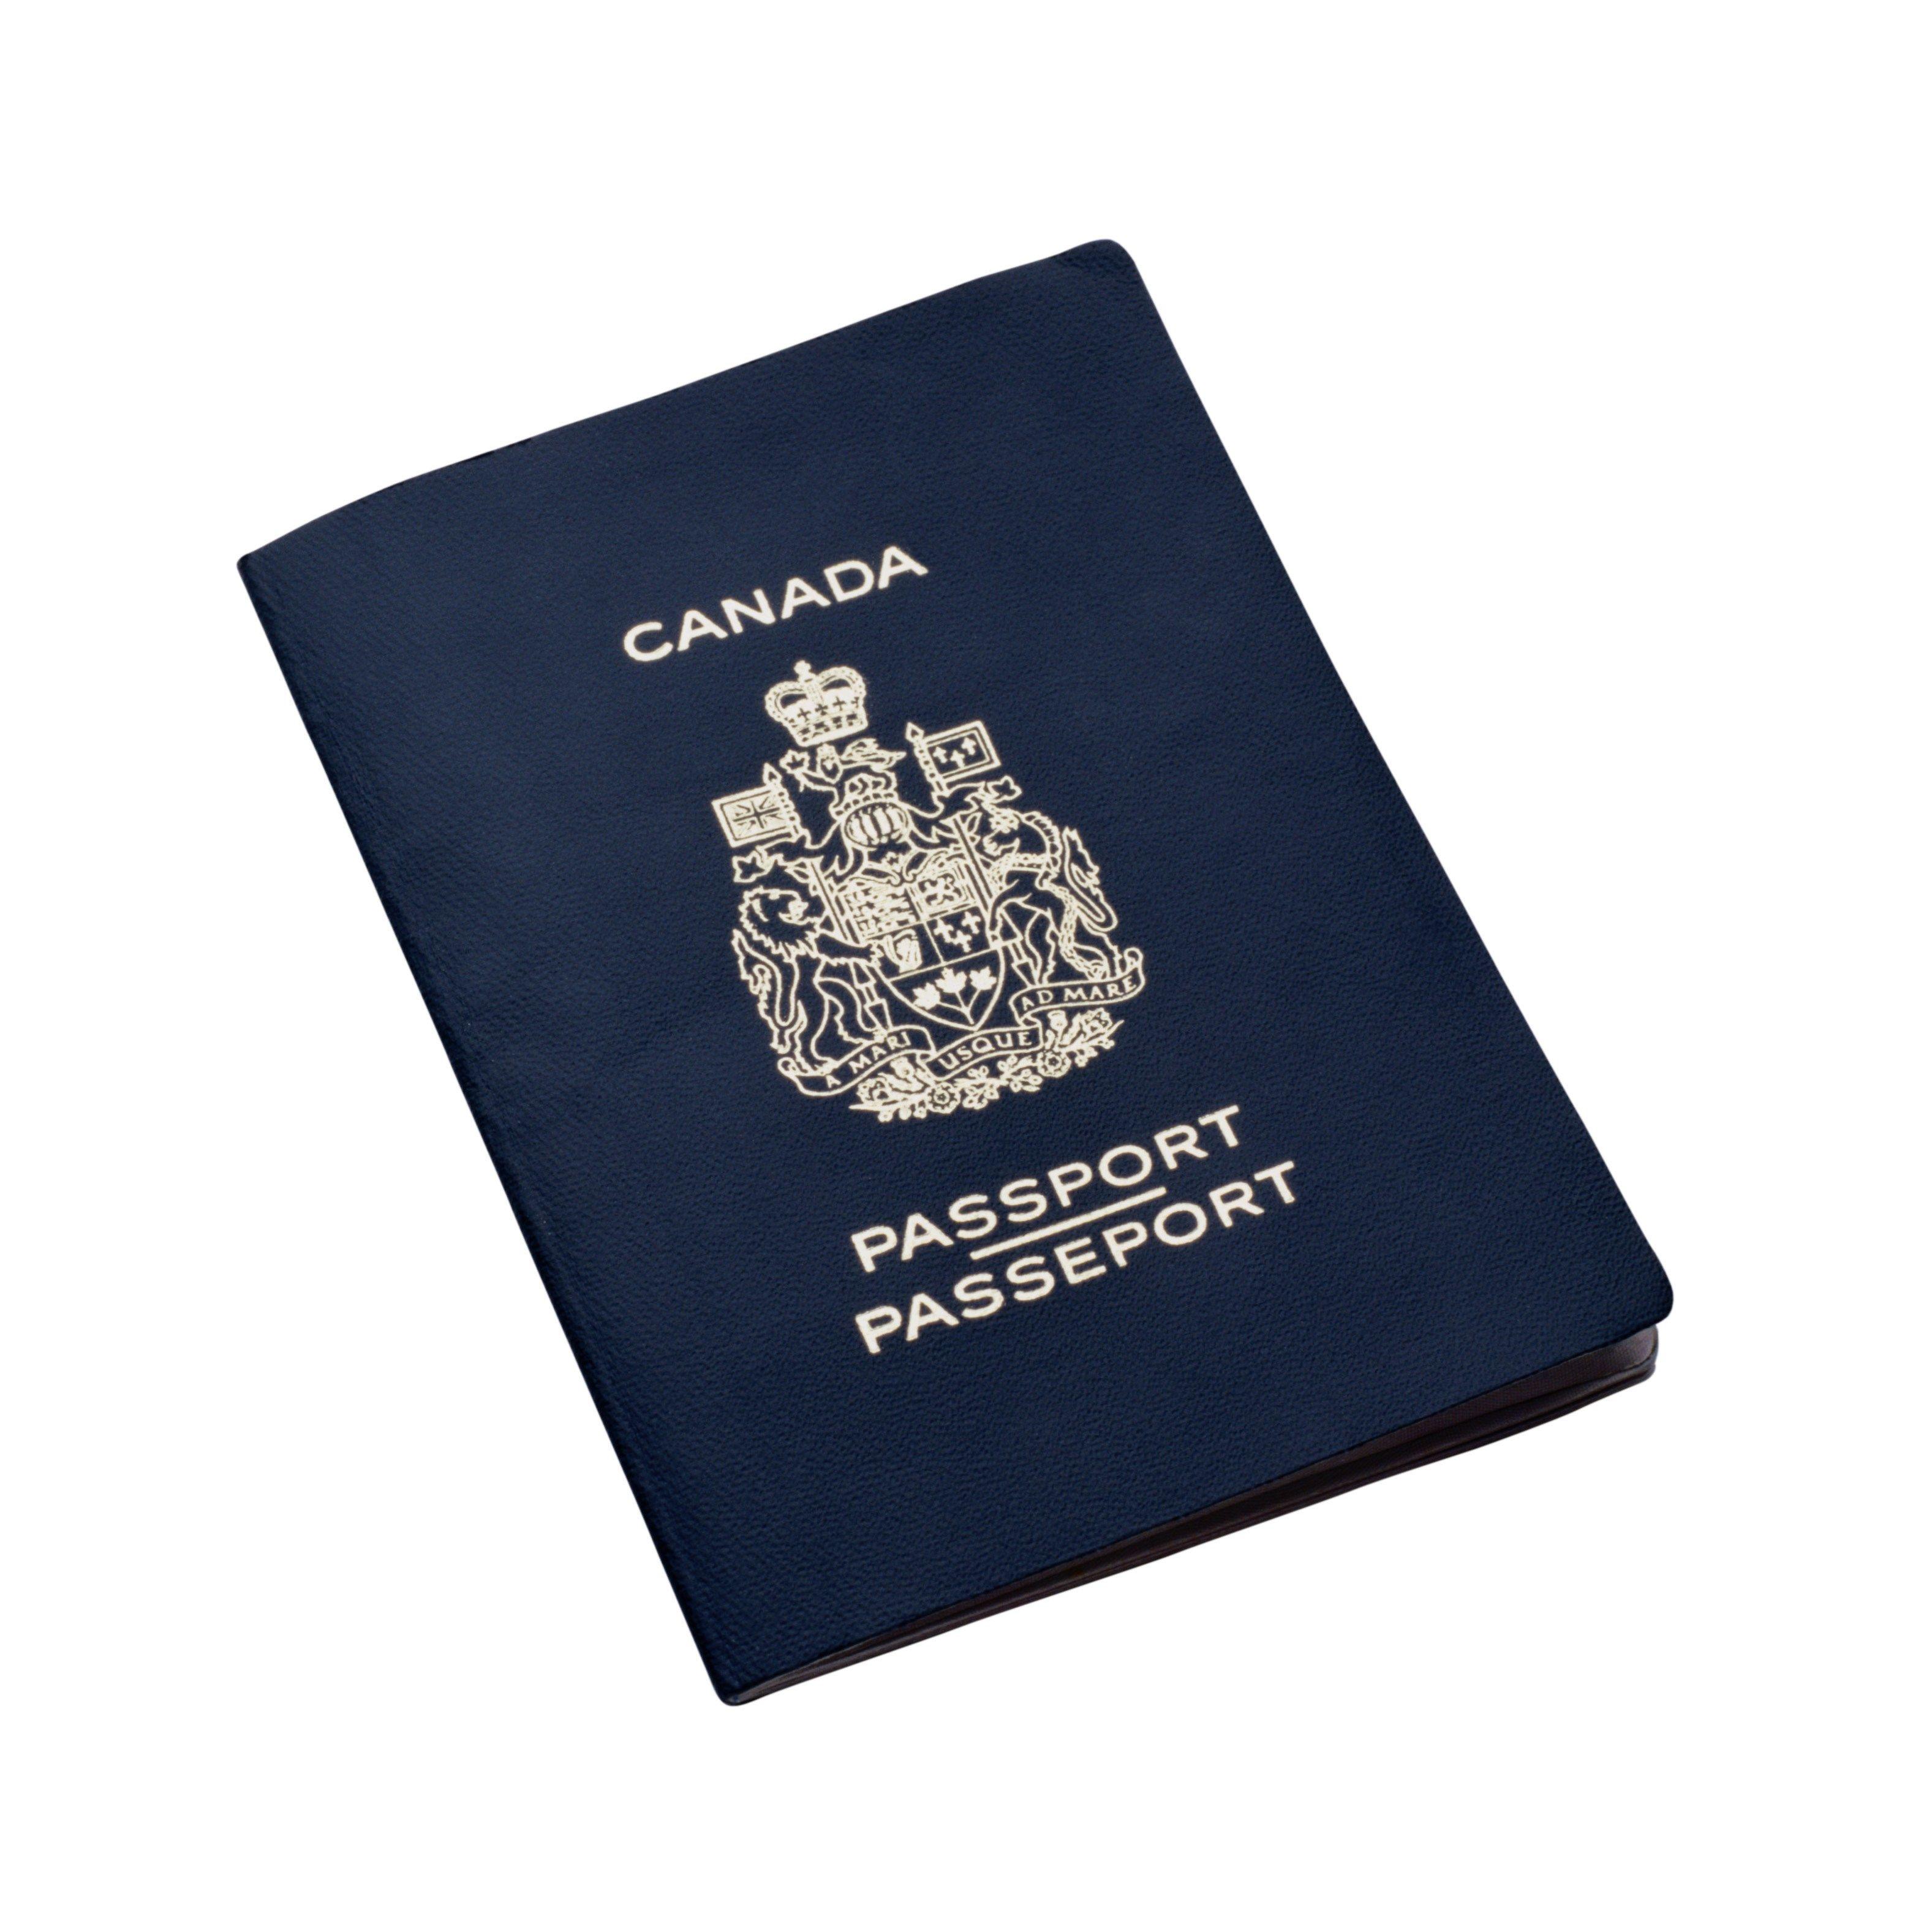 d52e46c38894e8cc55b92eaca751096c - How Long Does It Take To Get Passport Replaced